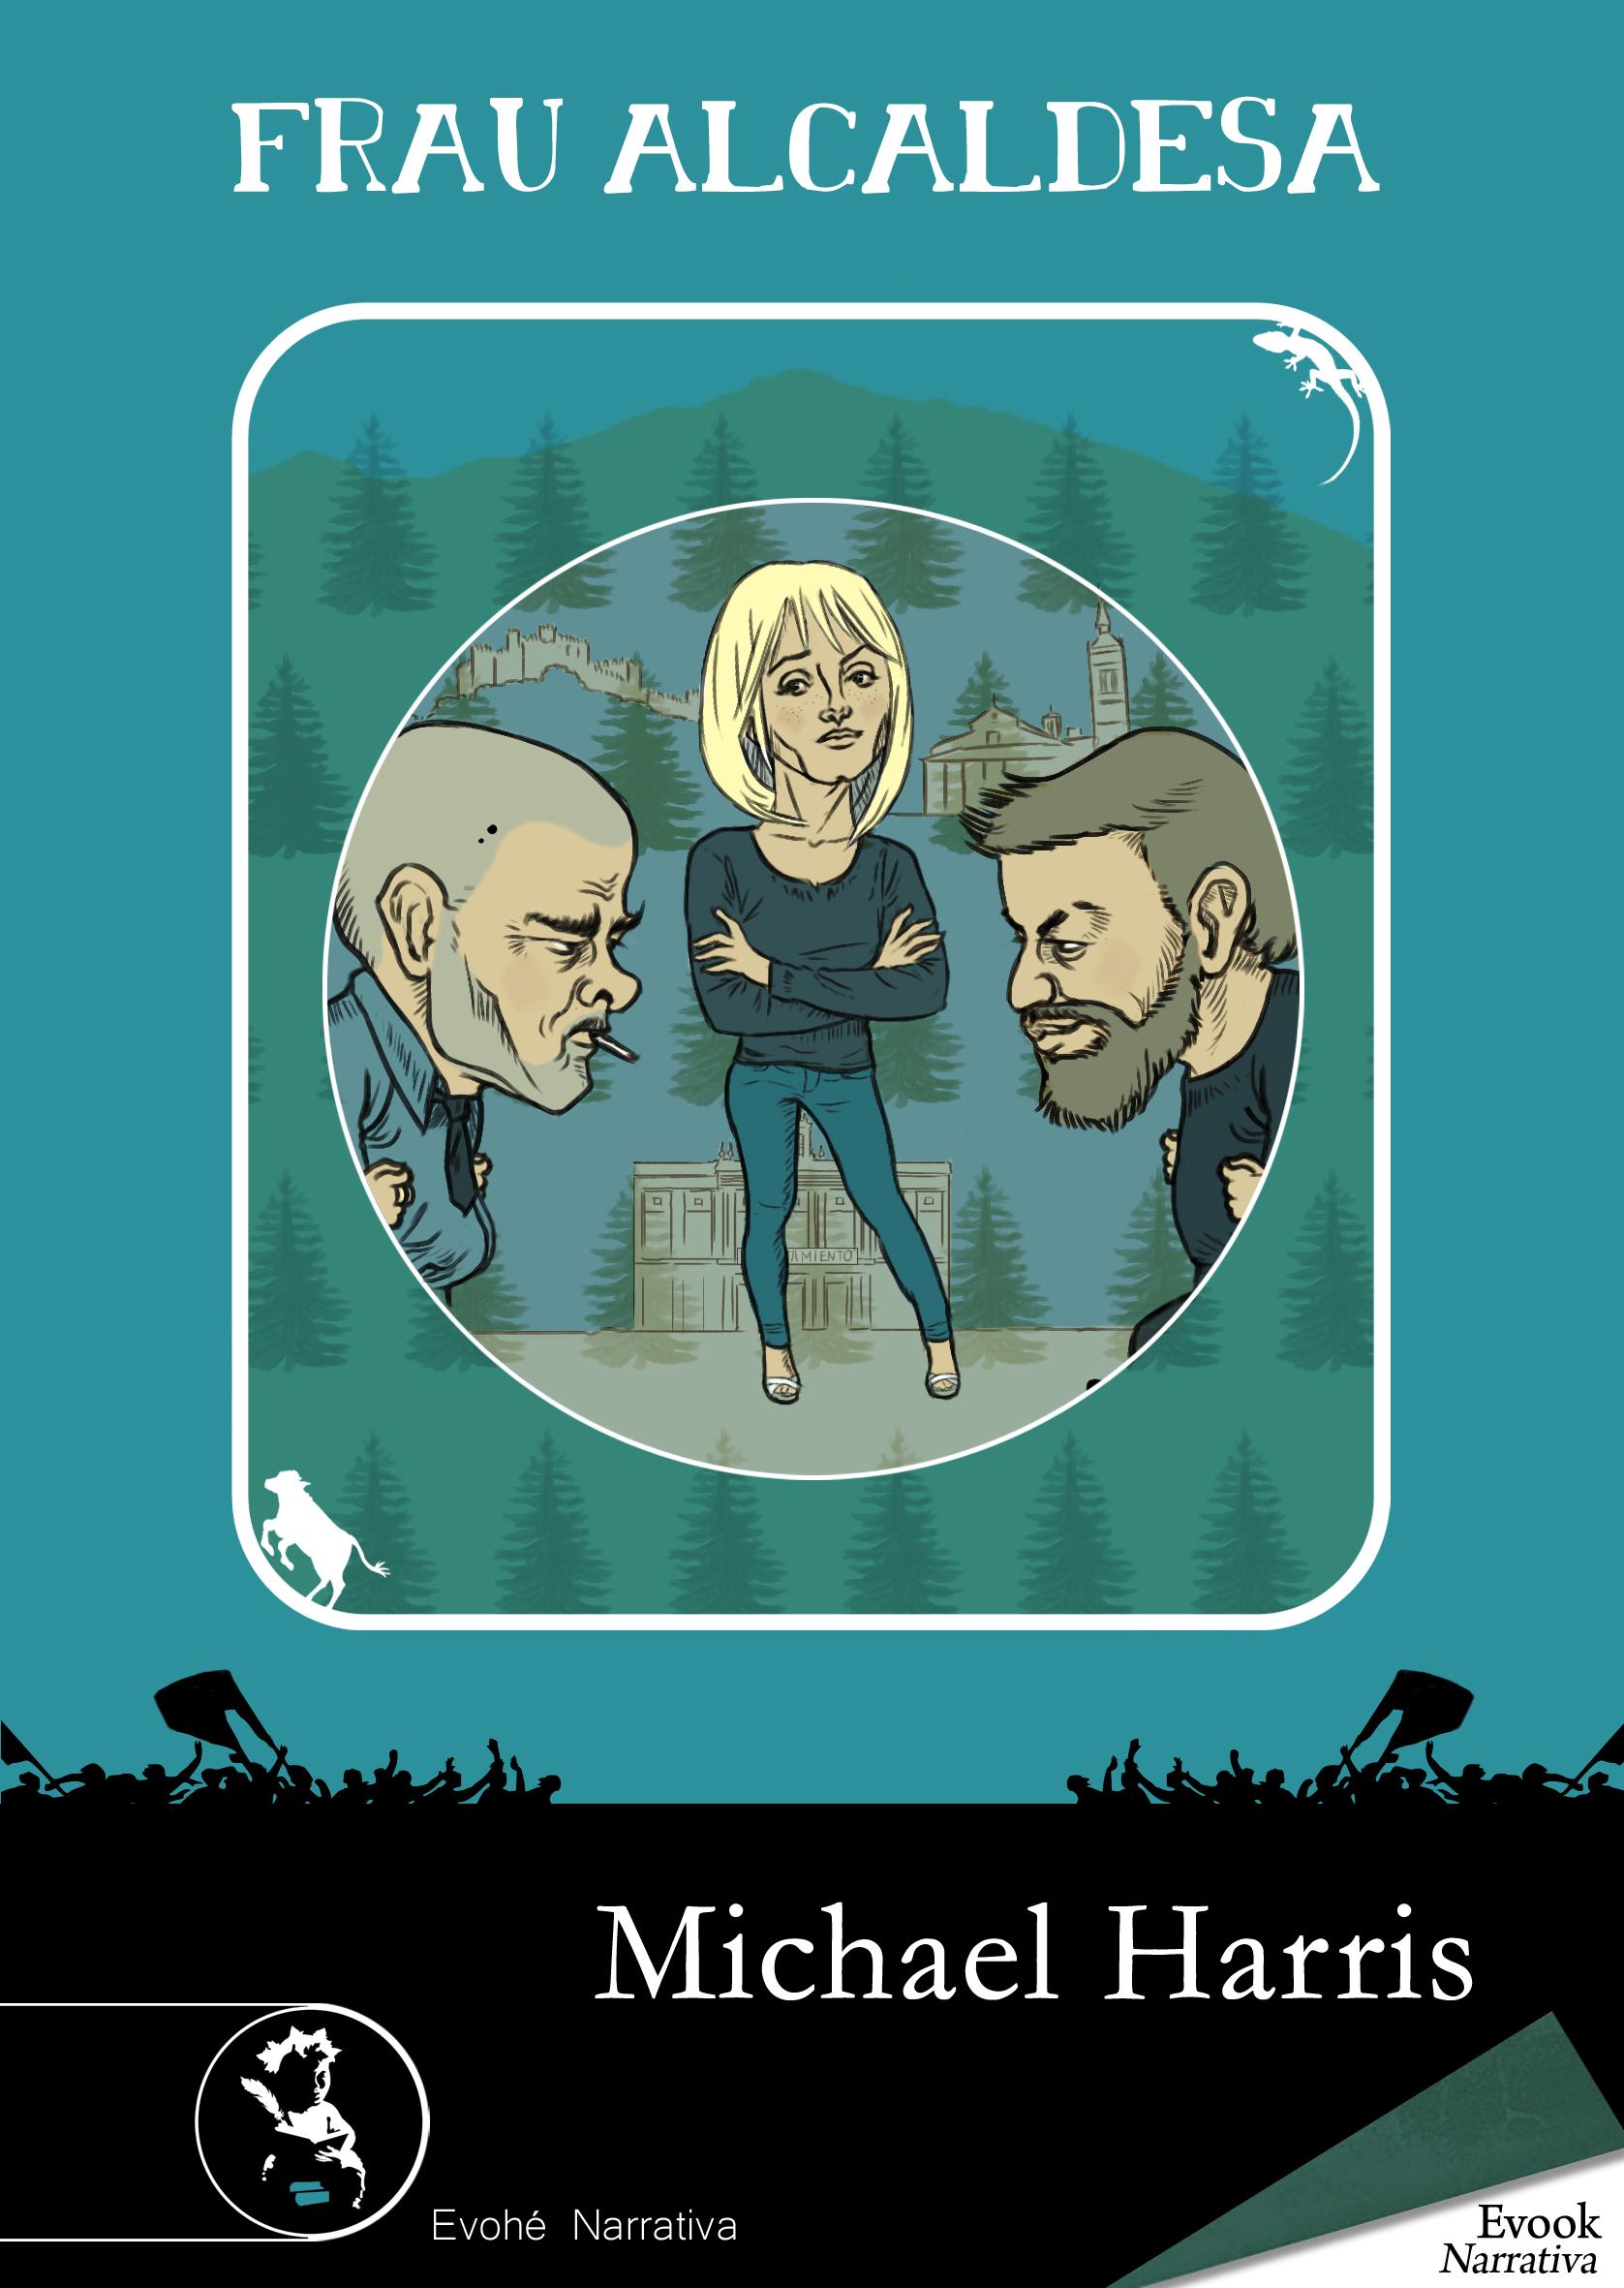 Frau Alcaldesa – Michael Harris